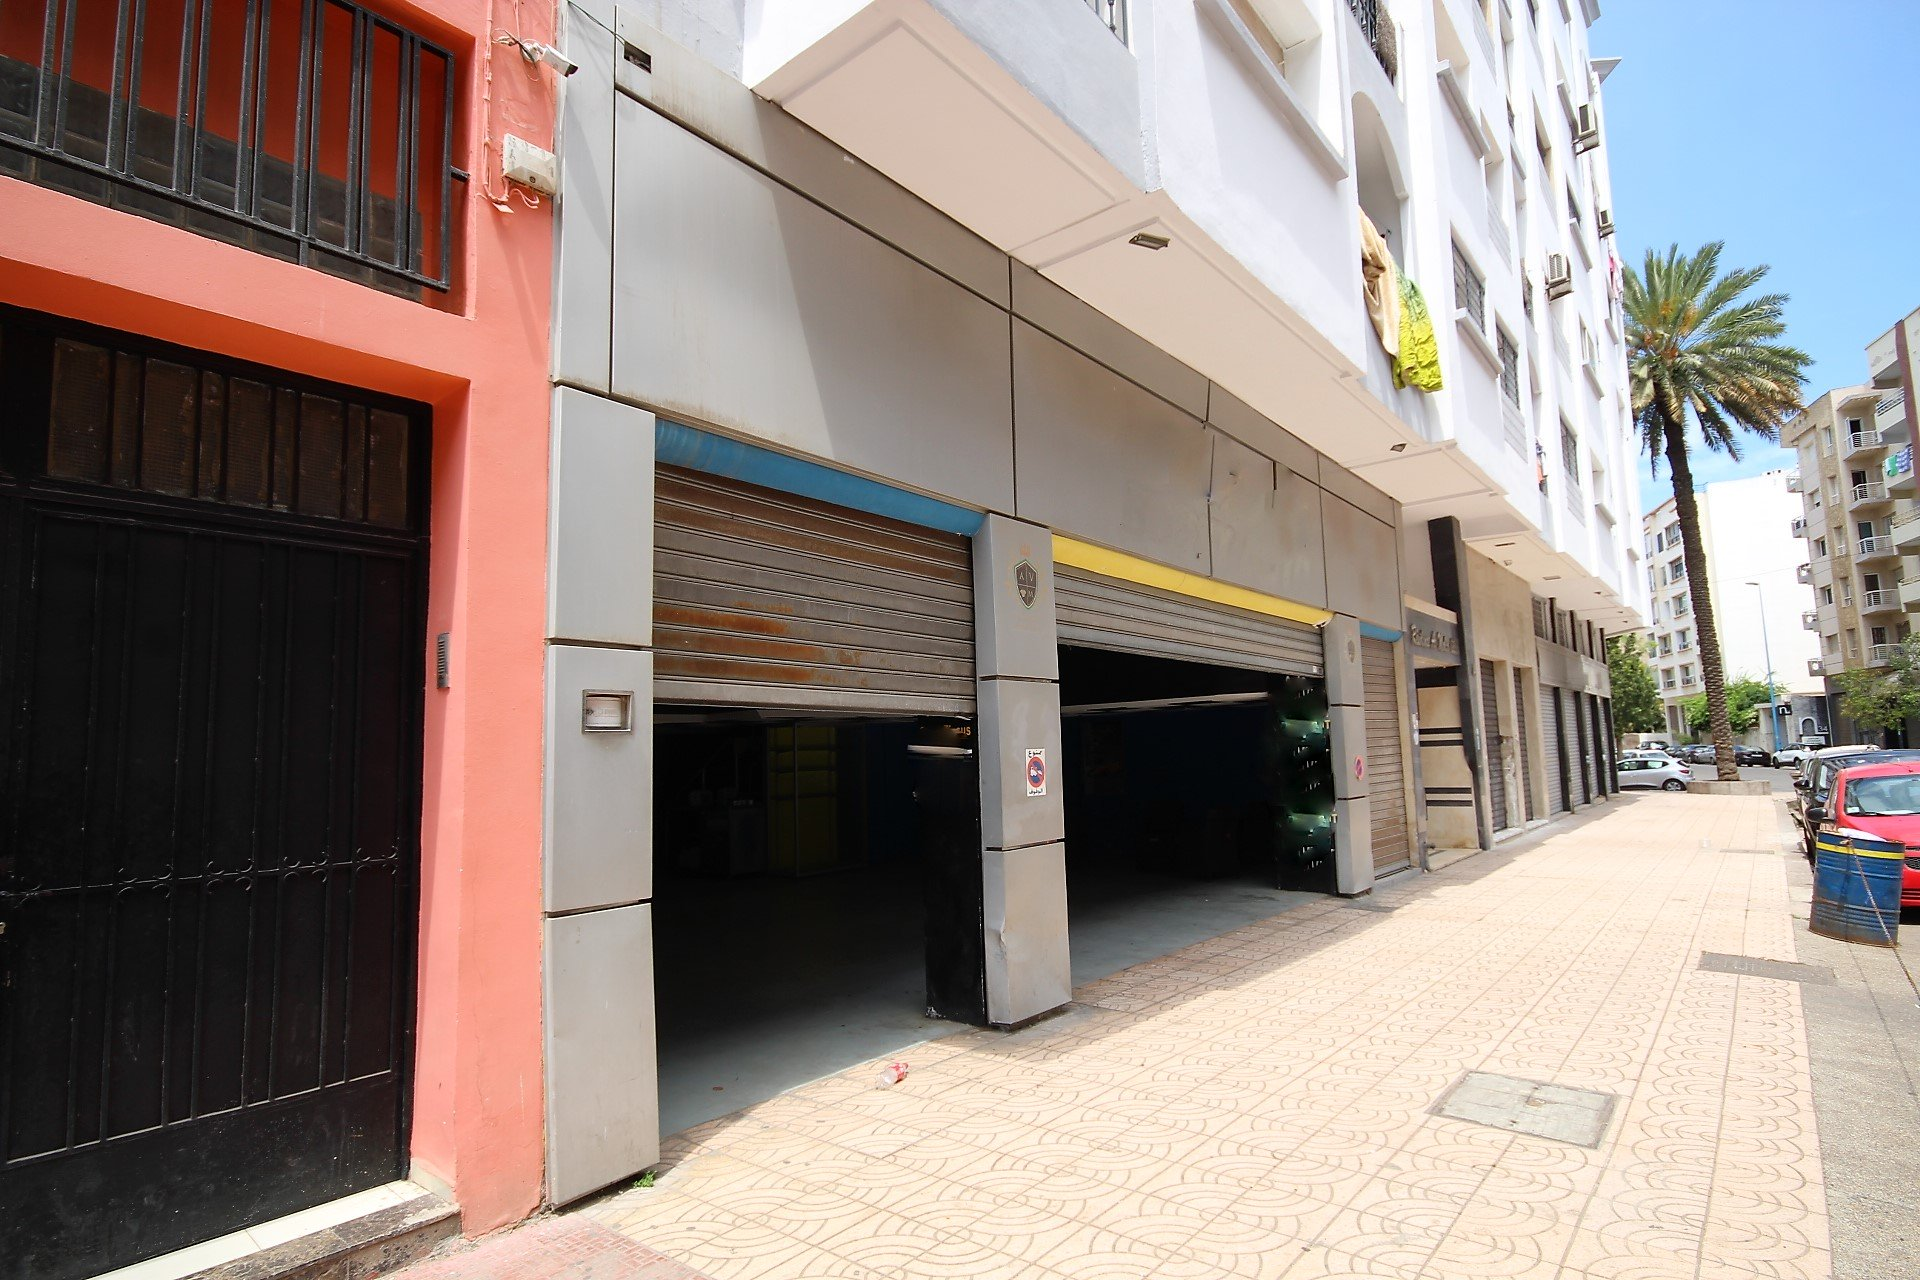 Casablanca,vend grand magasin sous pente offerte